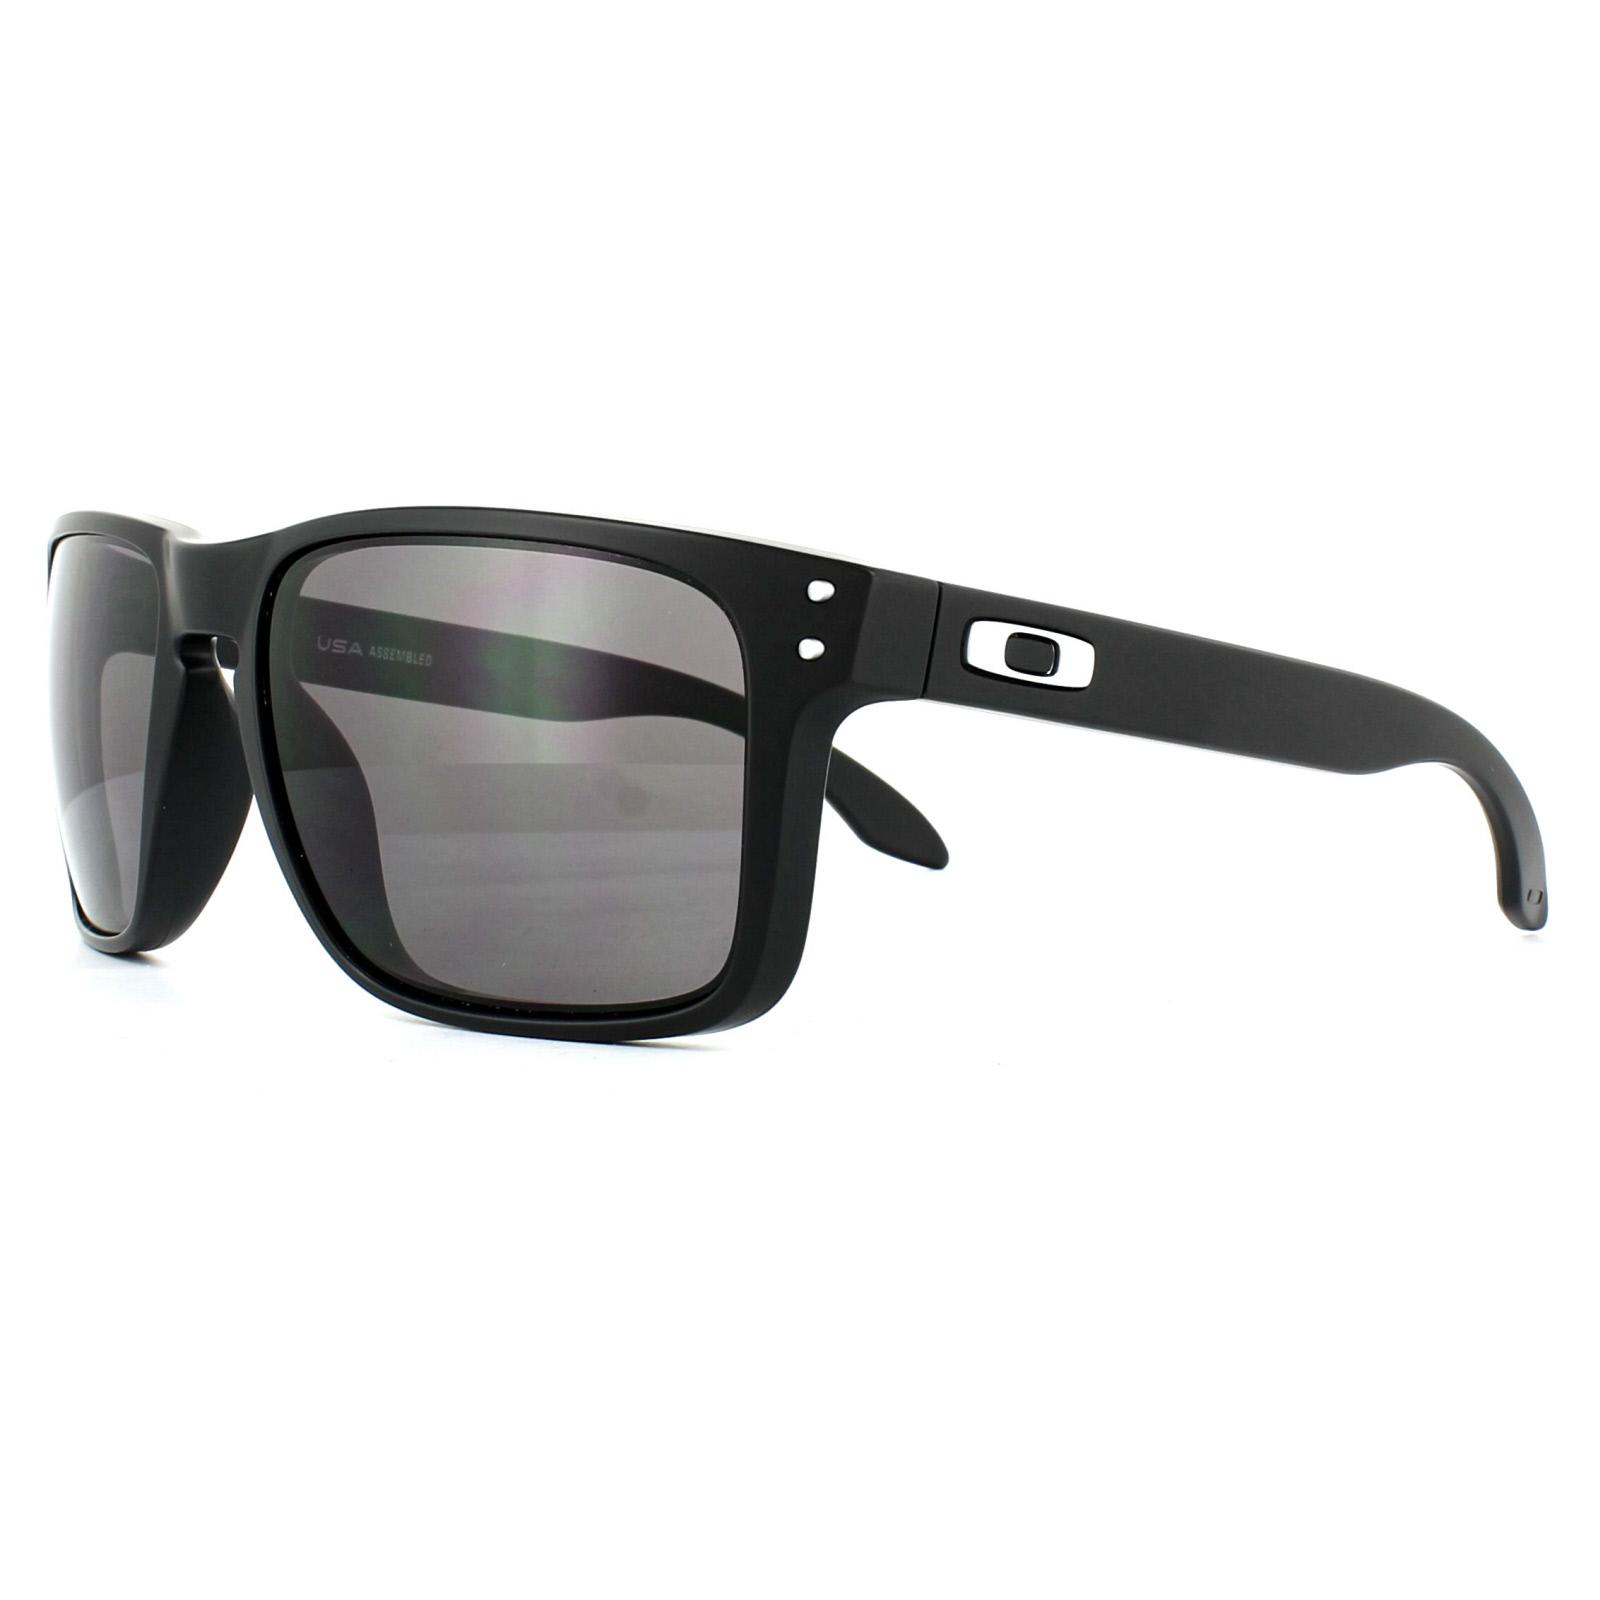 a2ecf919d9 Sentinel Oakley Sunglasses Holbrook XL OO9417-01 Matt Black Warm Grey